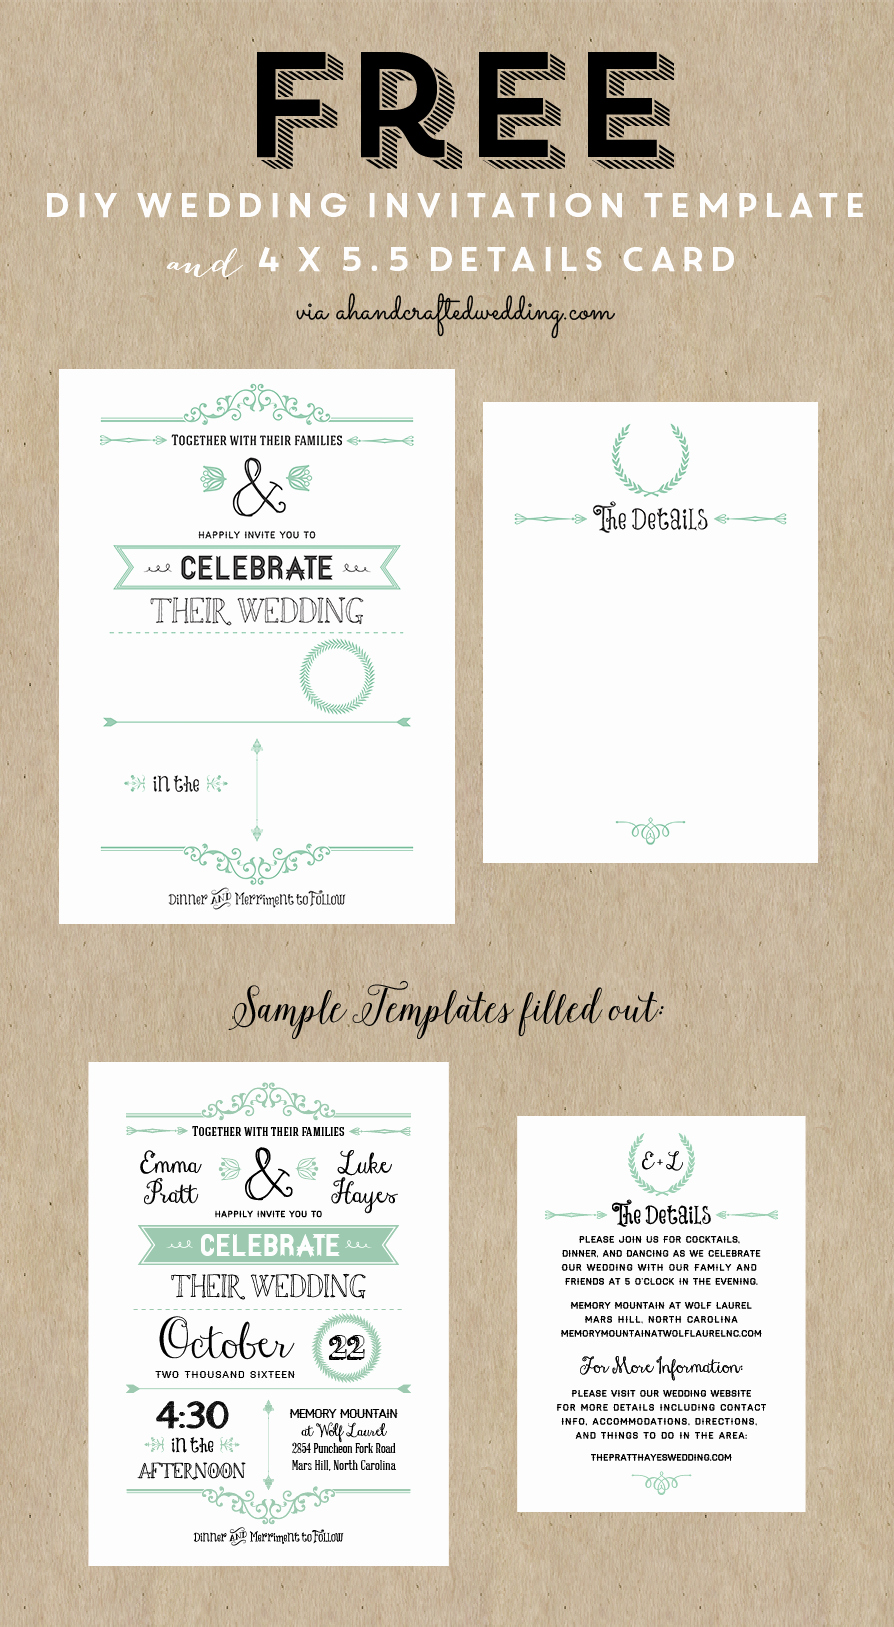 Free Wedding Invitation Templates Download Awesome Best 25 Free Wedding Invitation Templates Ideas On